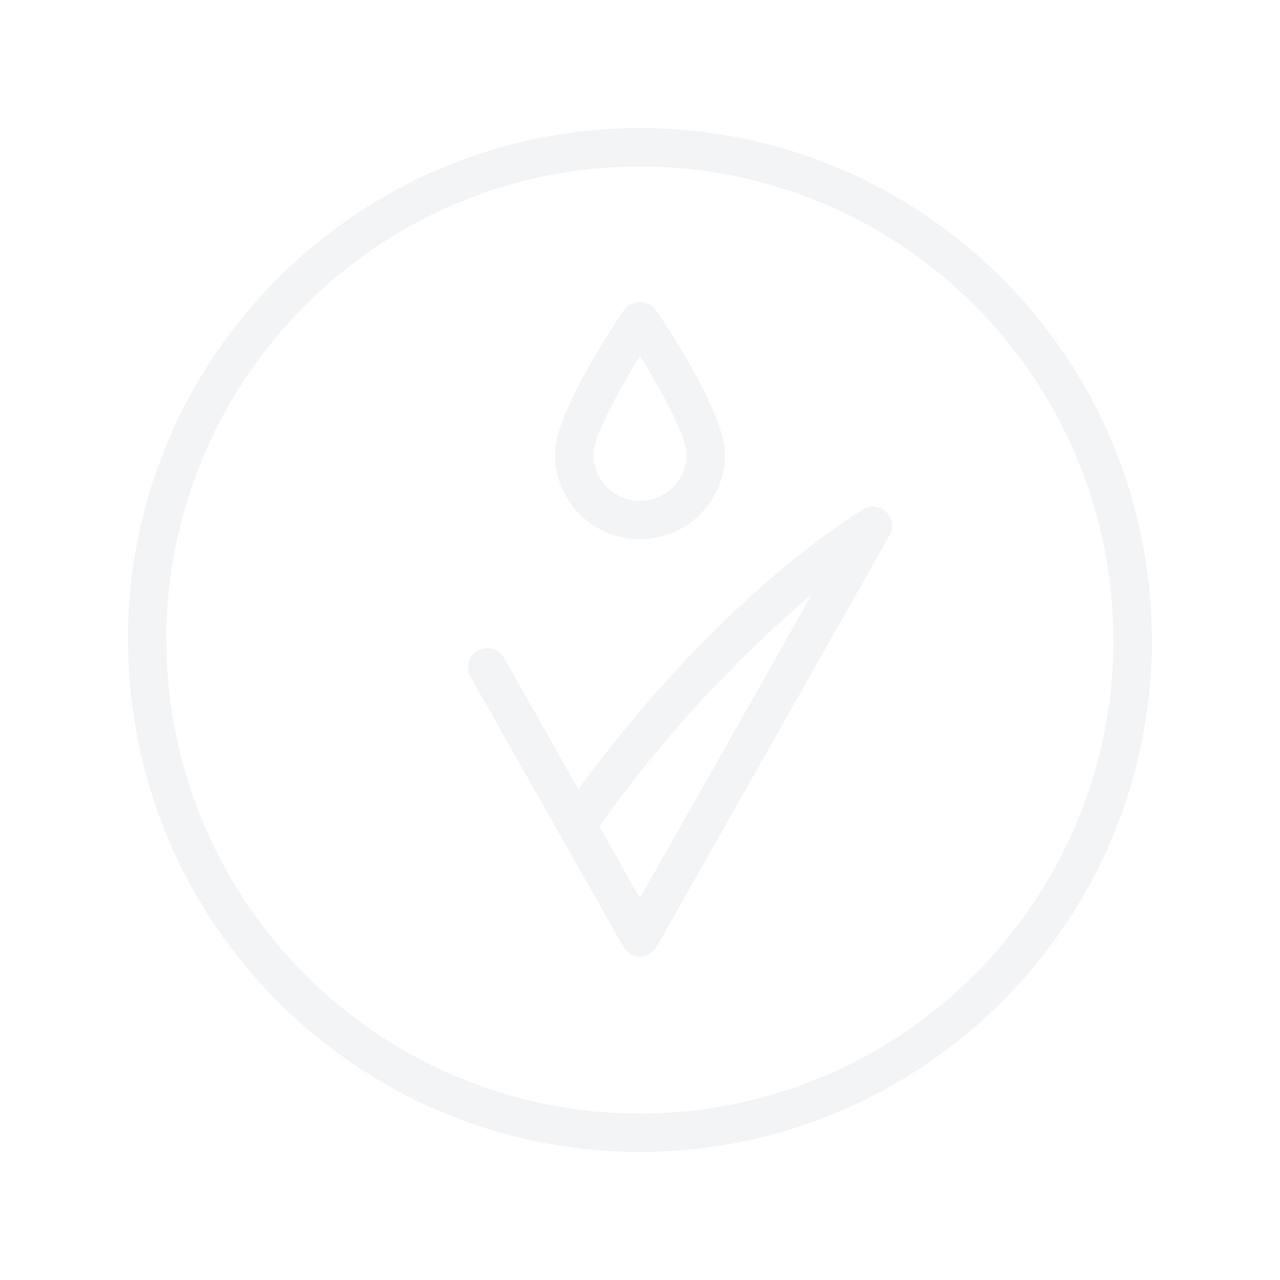 CHI Deep Brilliance Neutralizing Shampoo глубоко очищающий и нейтрализуйющий шампунь